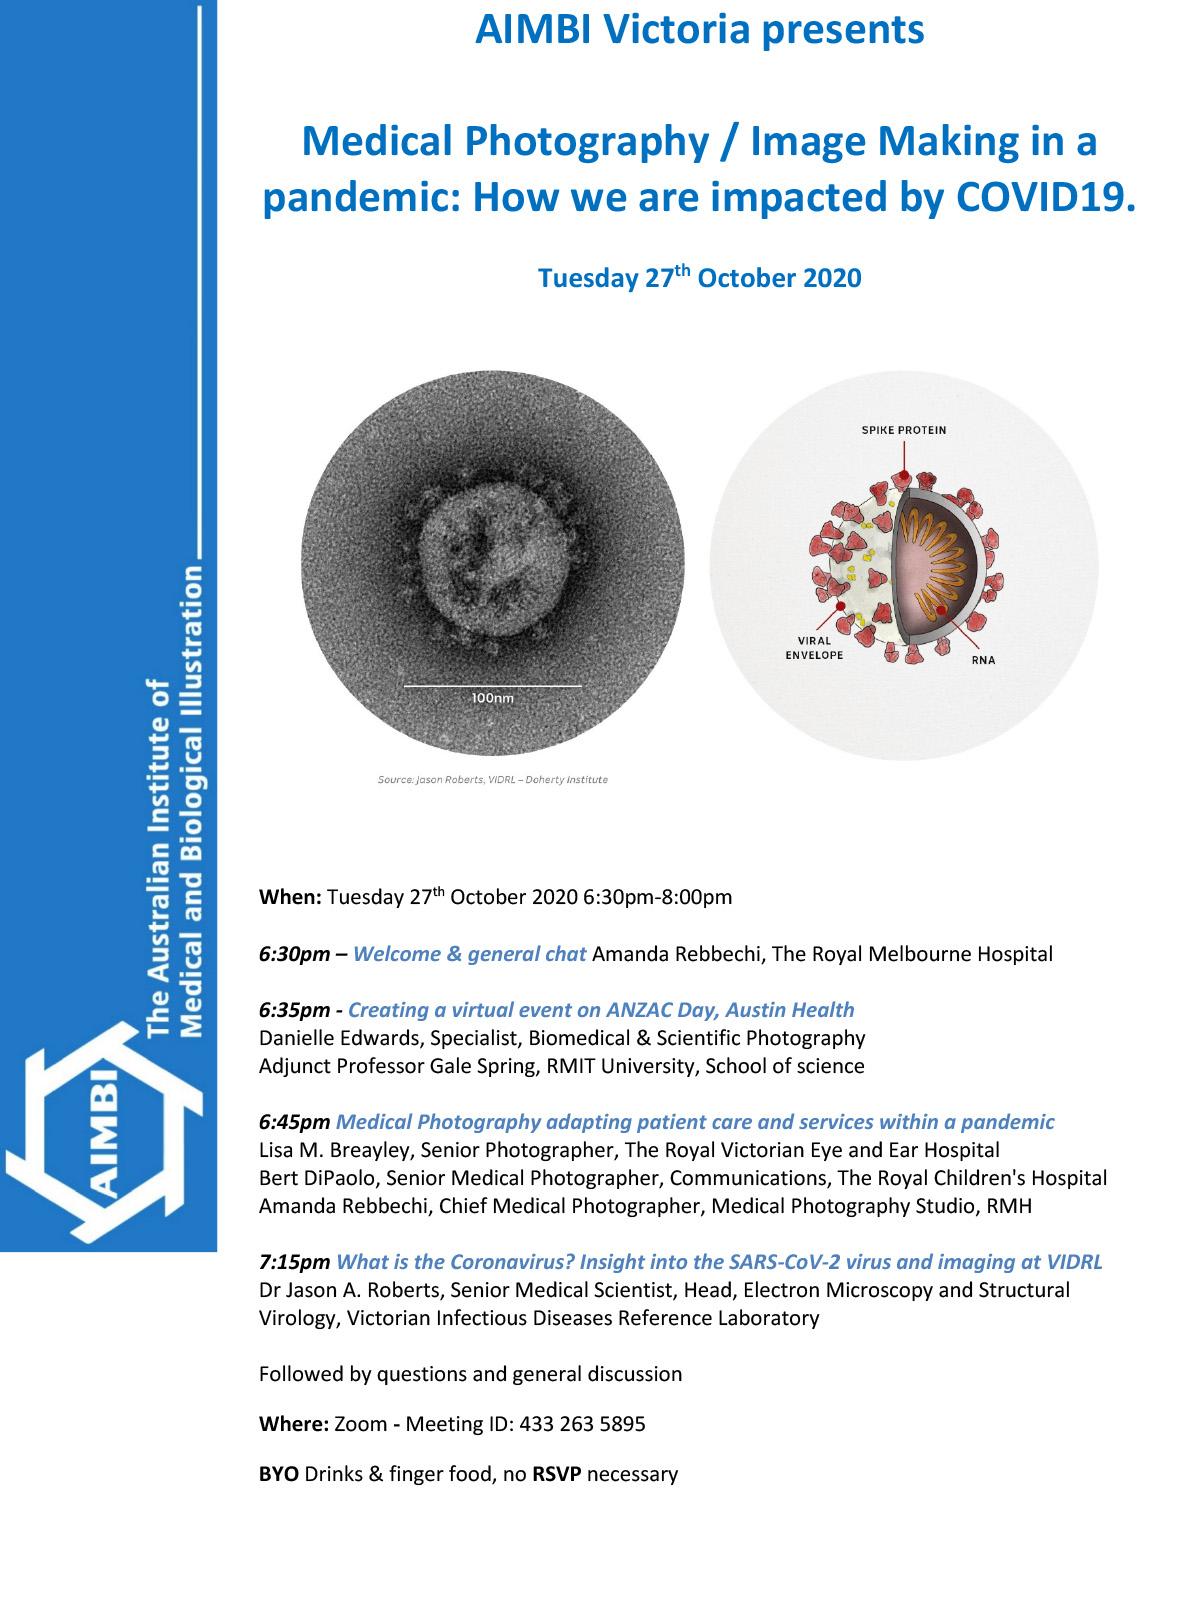 2020-AIMBI-VIC-COVID-27Oct-Meeting-invite-final